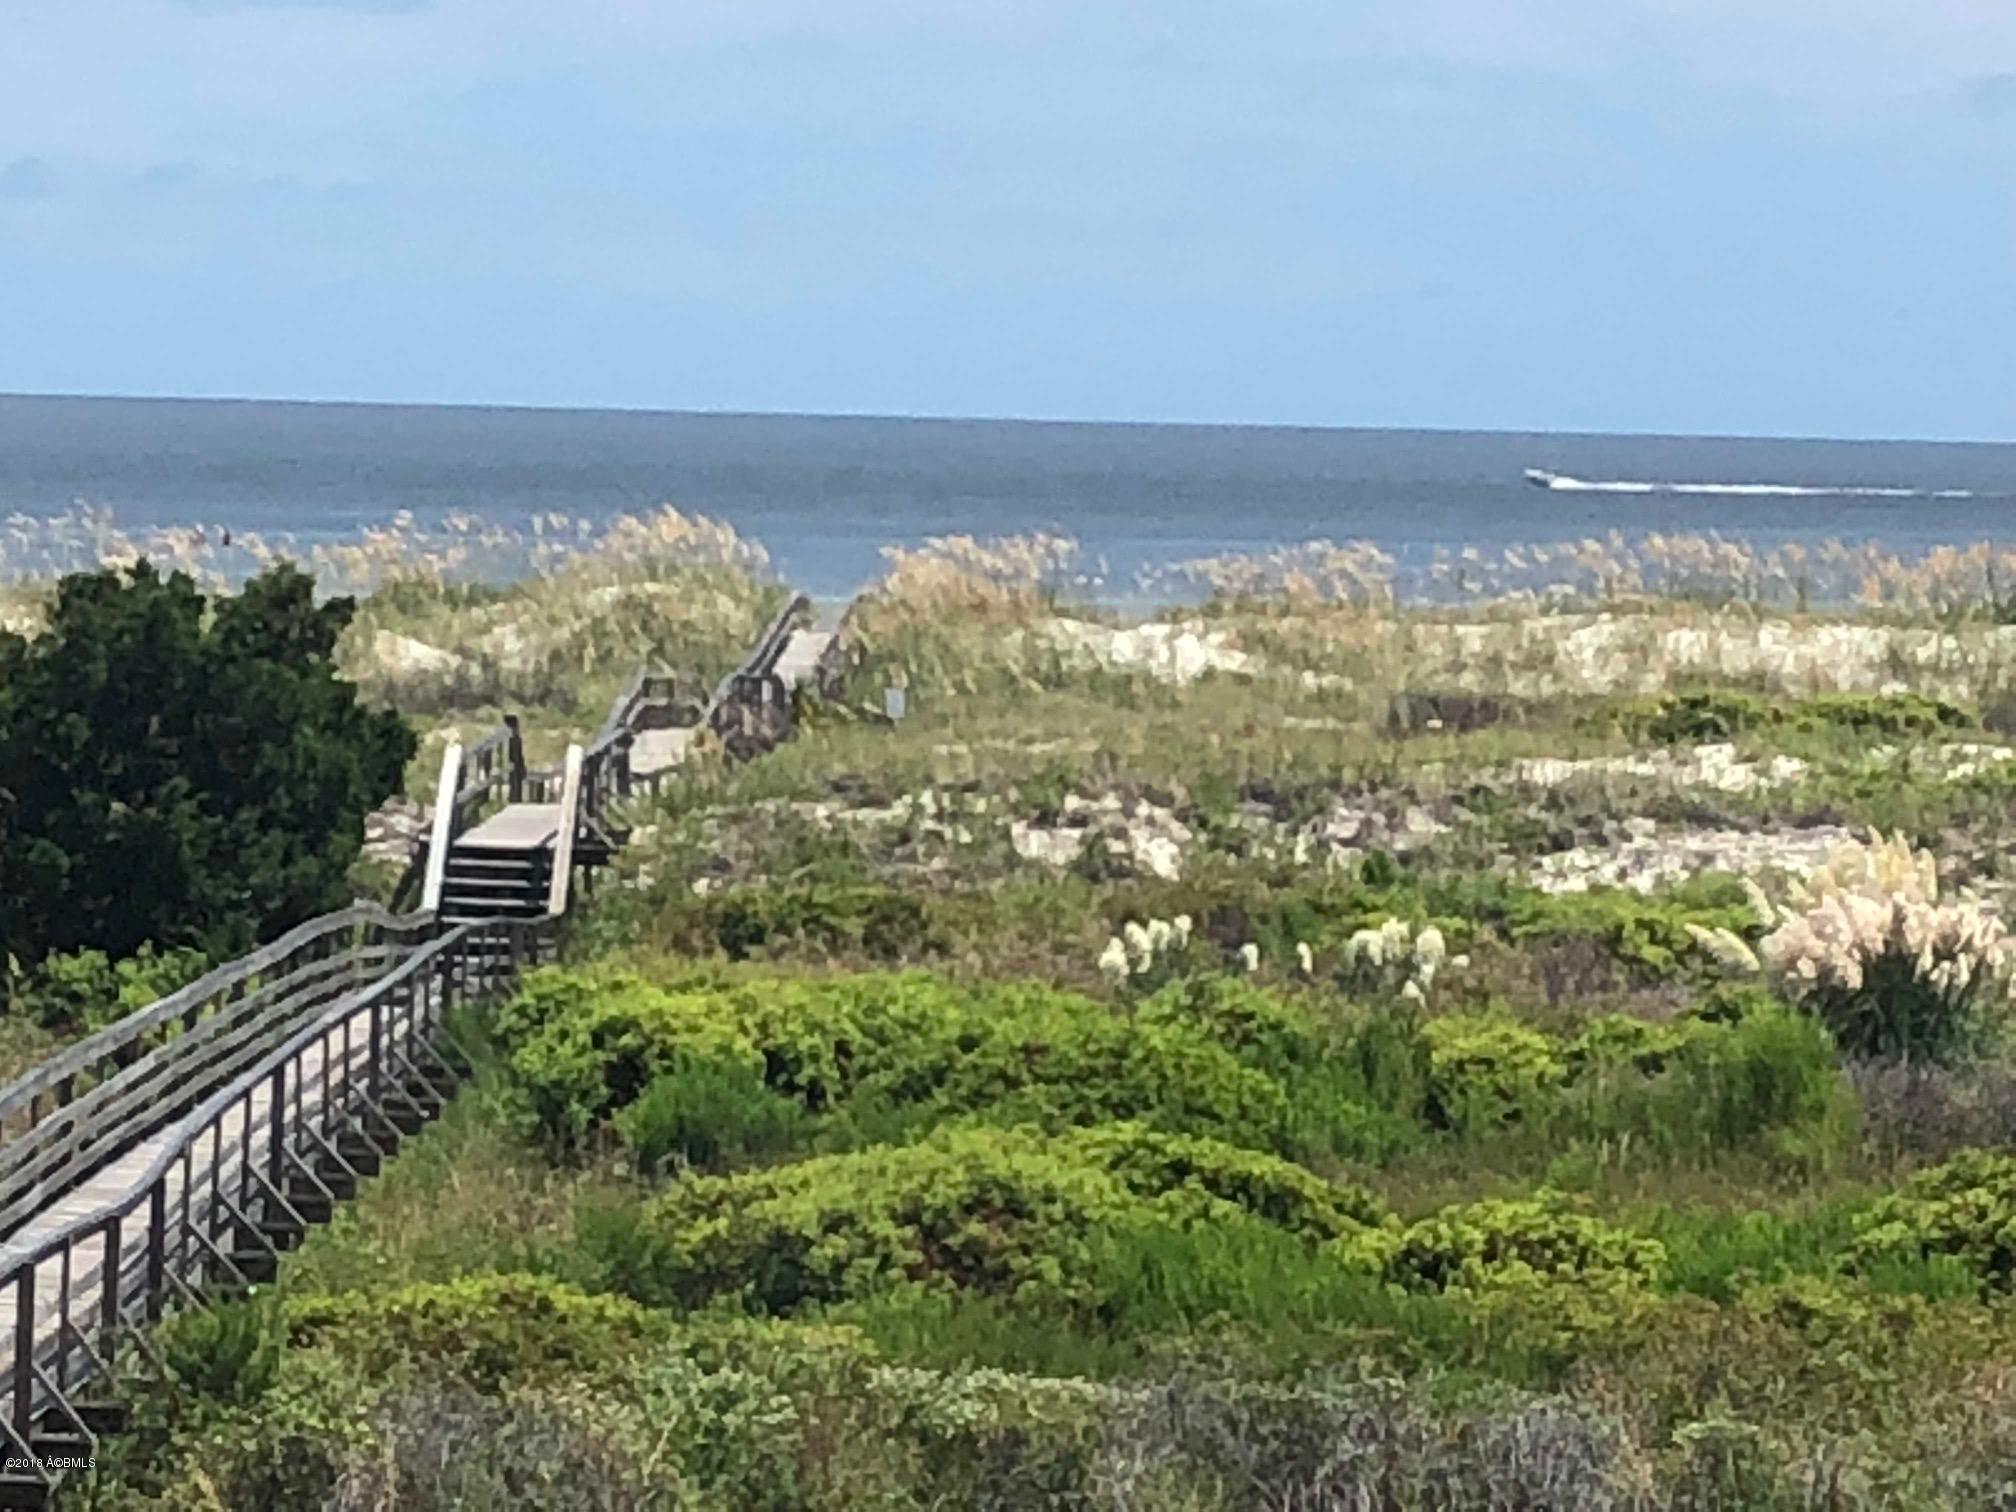 Harbos Island Beach in South Carolina